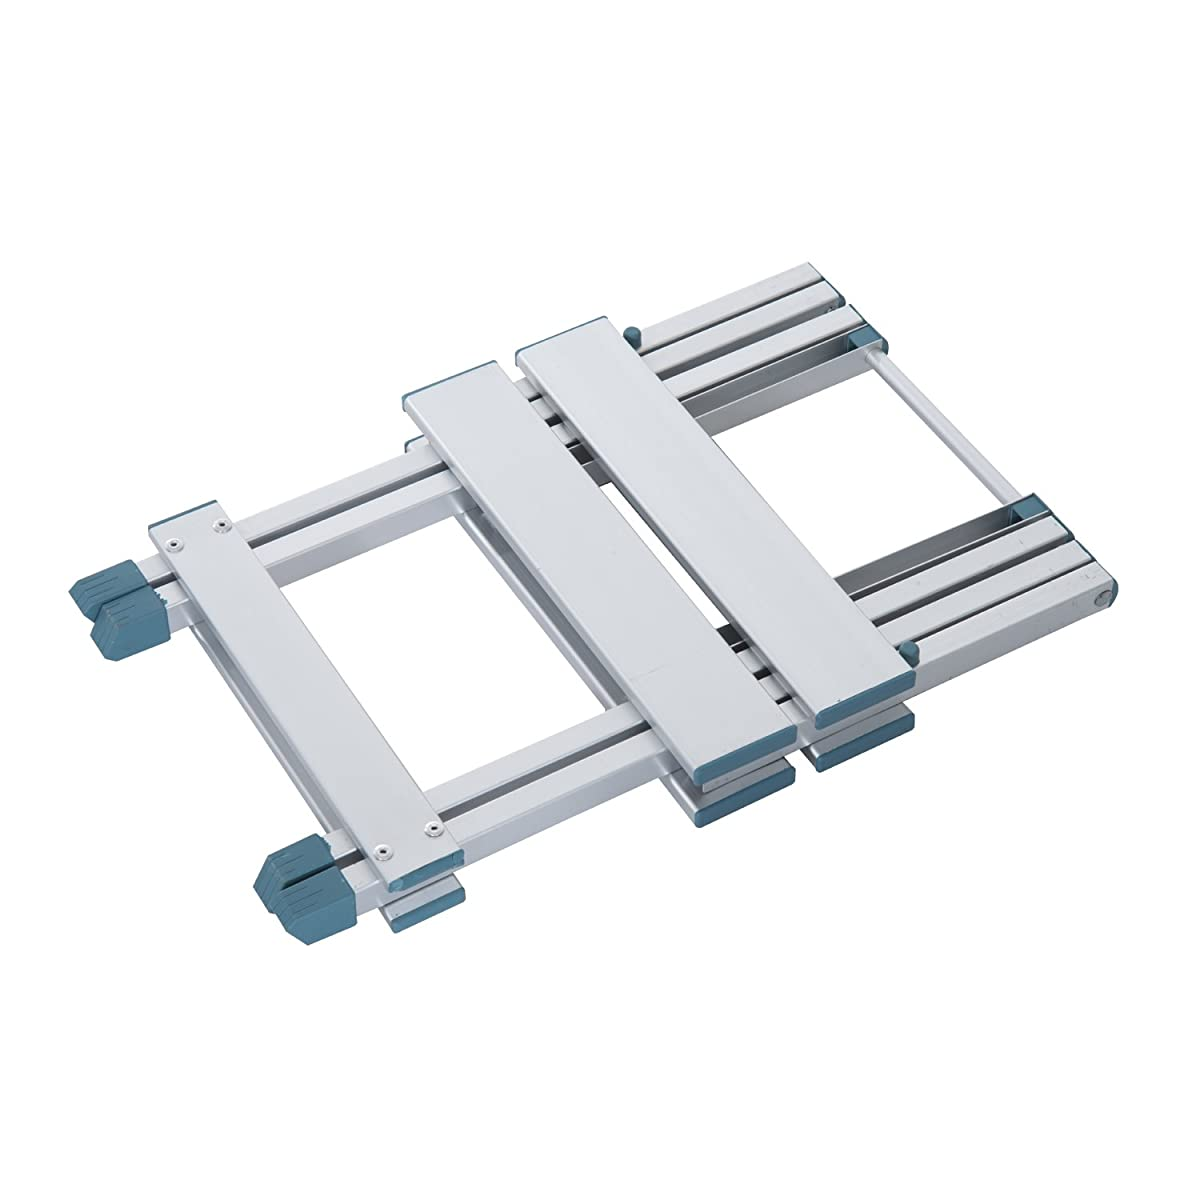 Outsunny 4 Portable Folding Outdoor Picnic Table w/ 4 Seats - Silver